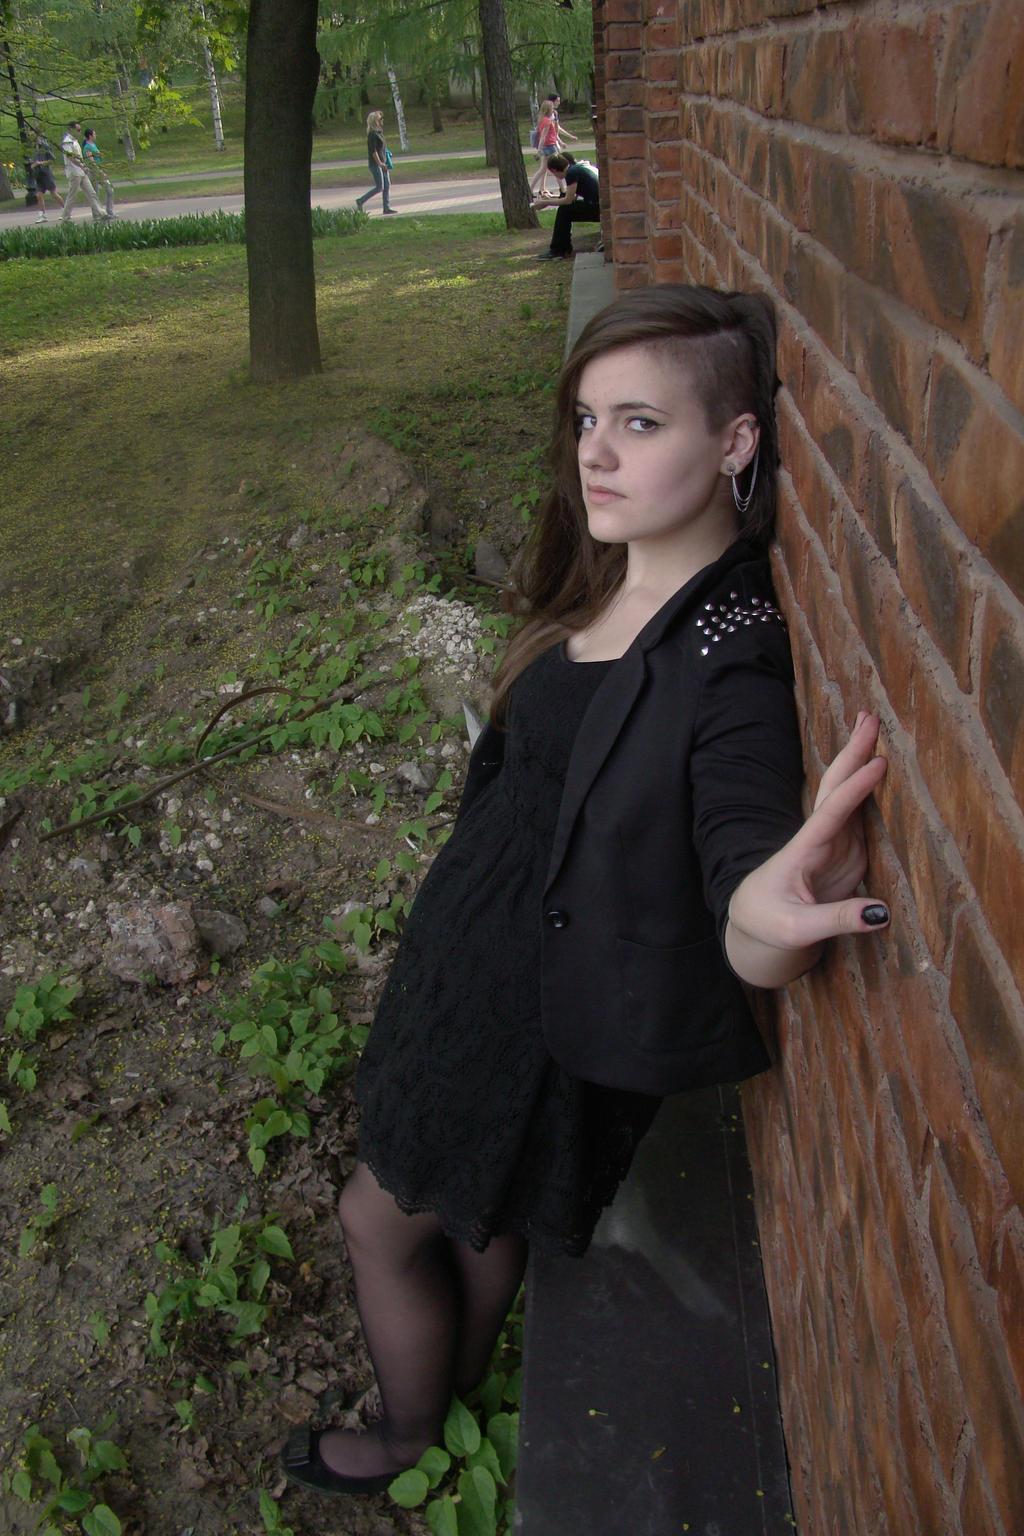 Irina black dress stock 7 by Panopticon-Stock